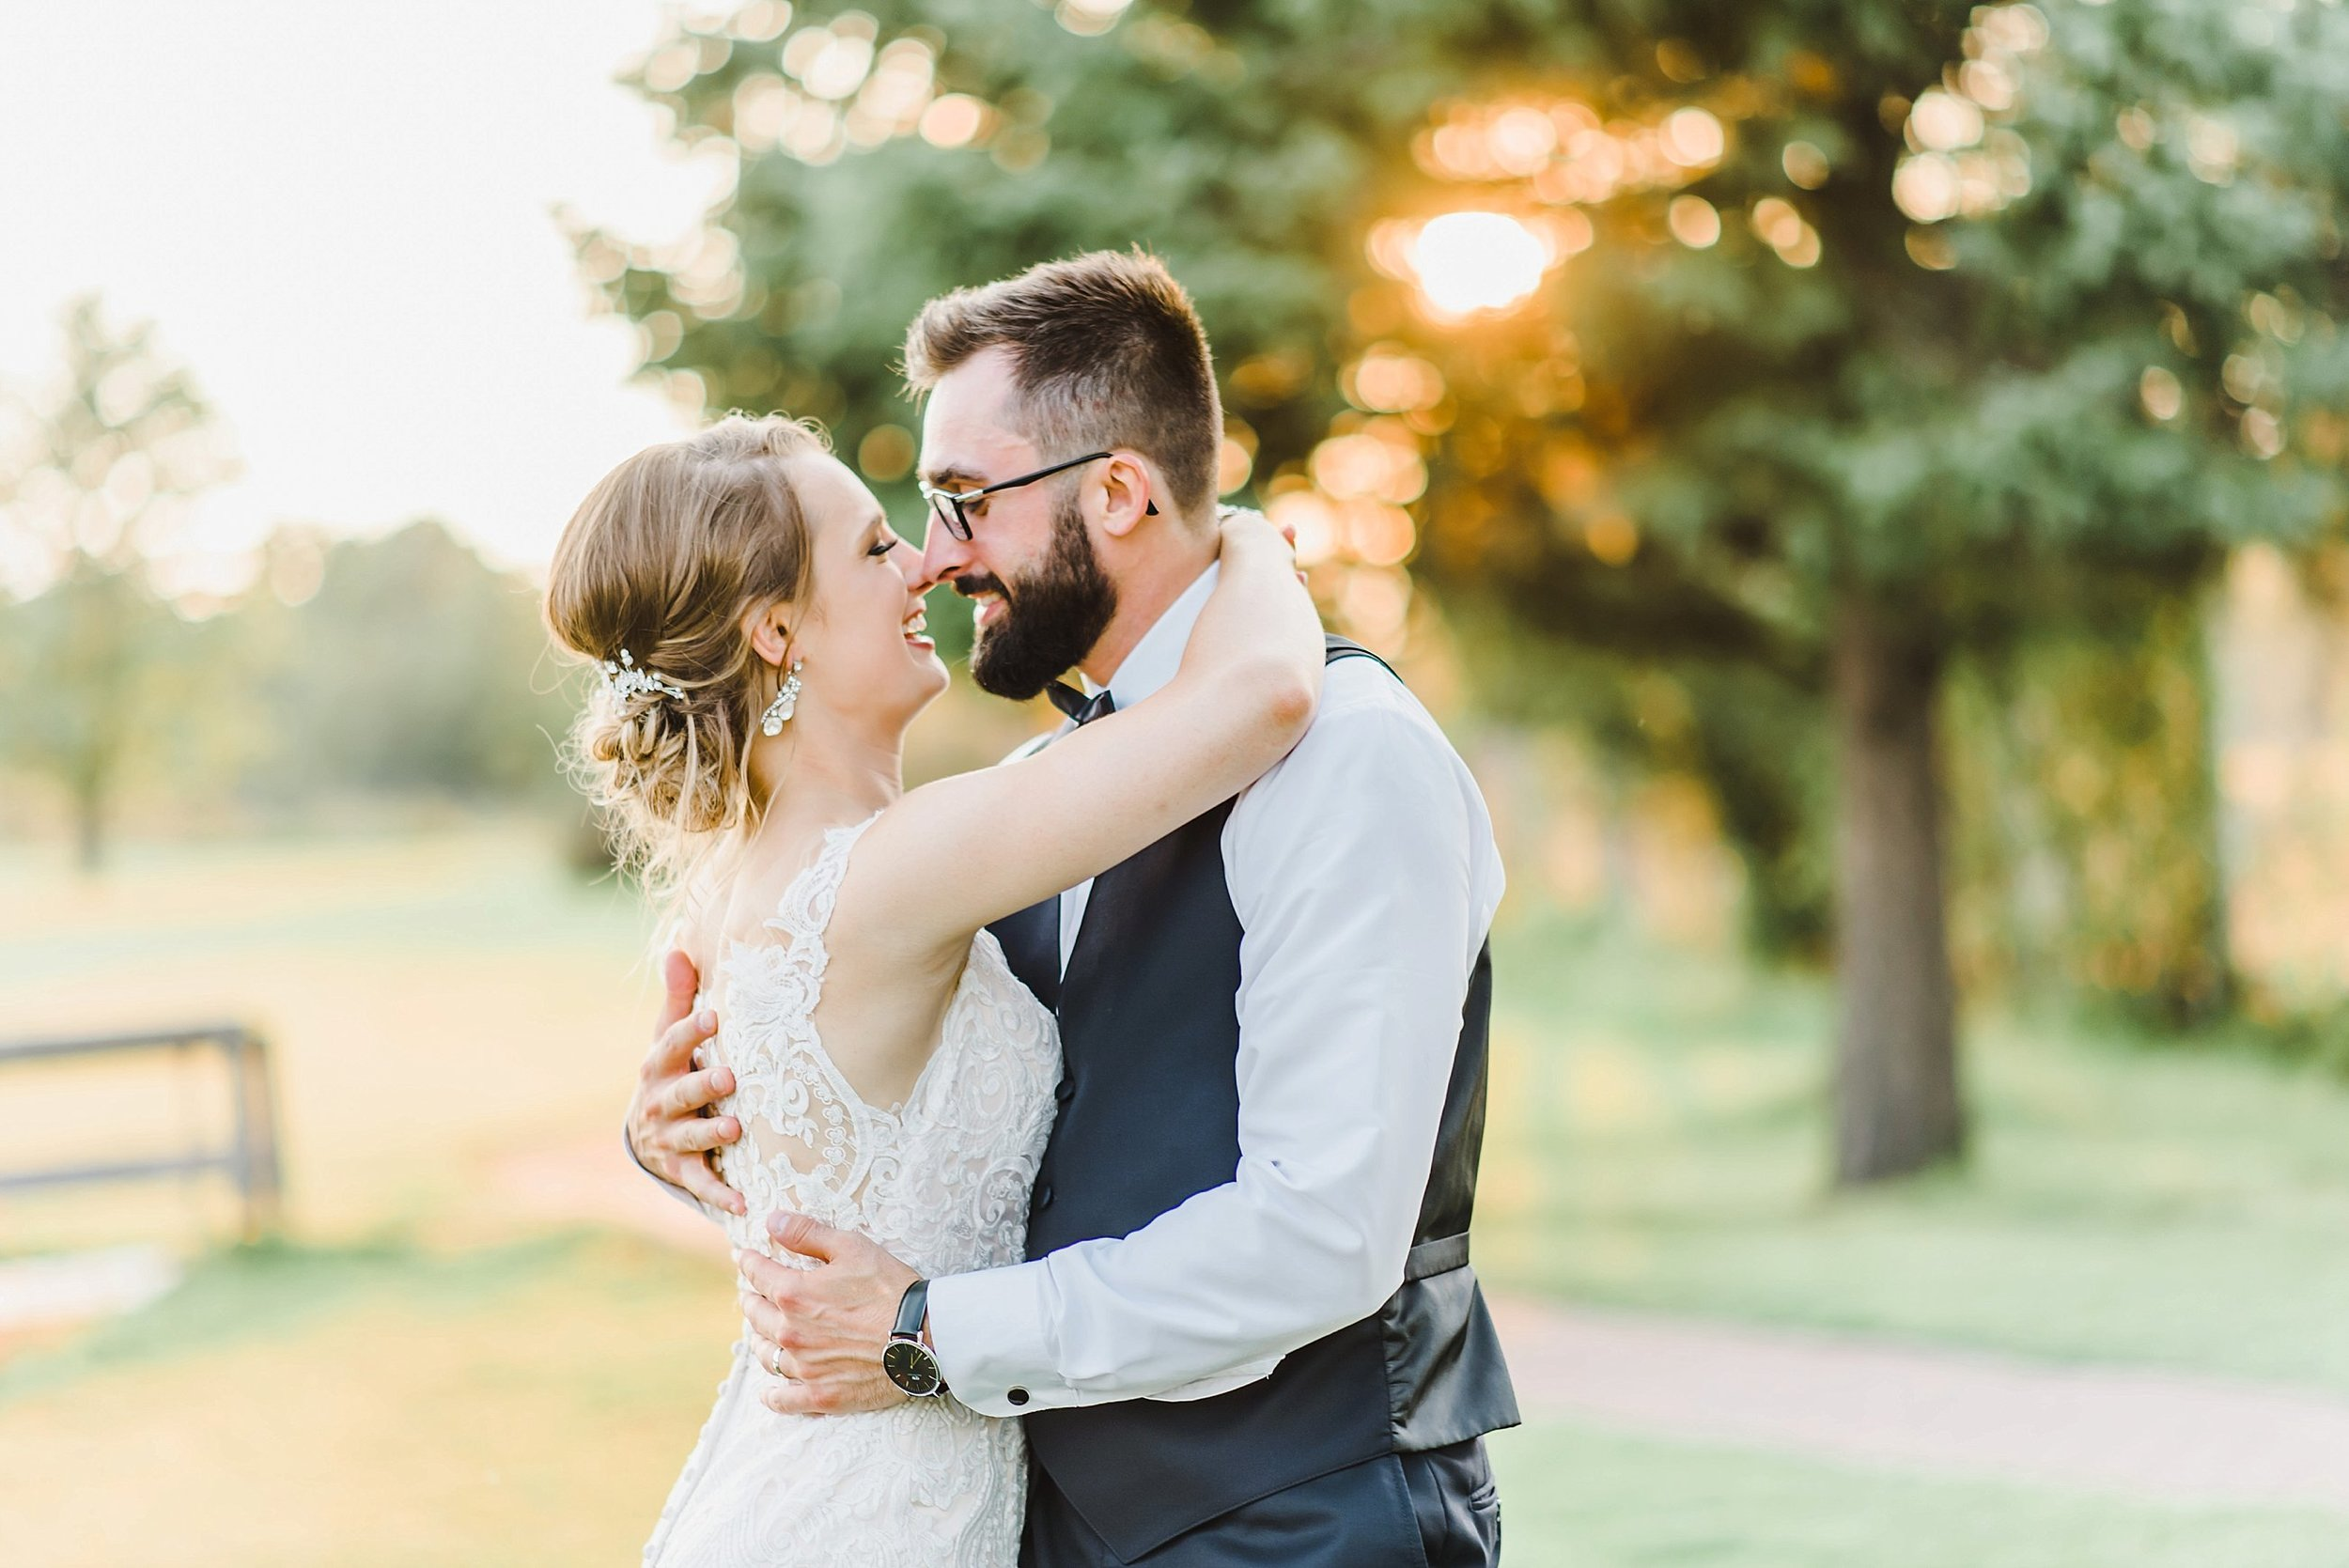 light airy indie fine art ottawa wedding photographer | Ali and Batoul Photography_1350.jpg